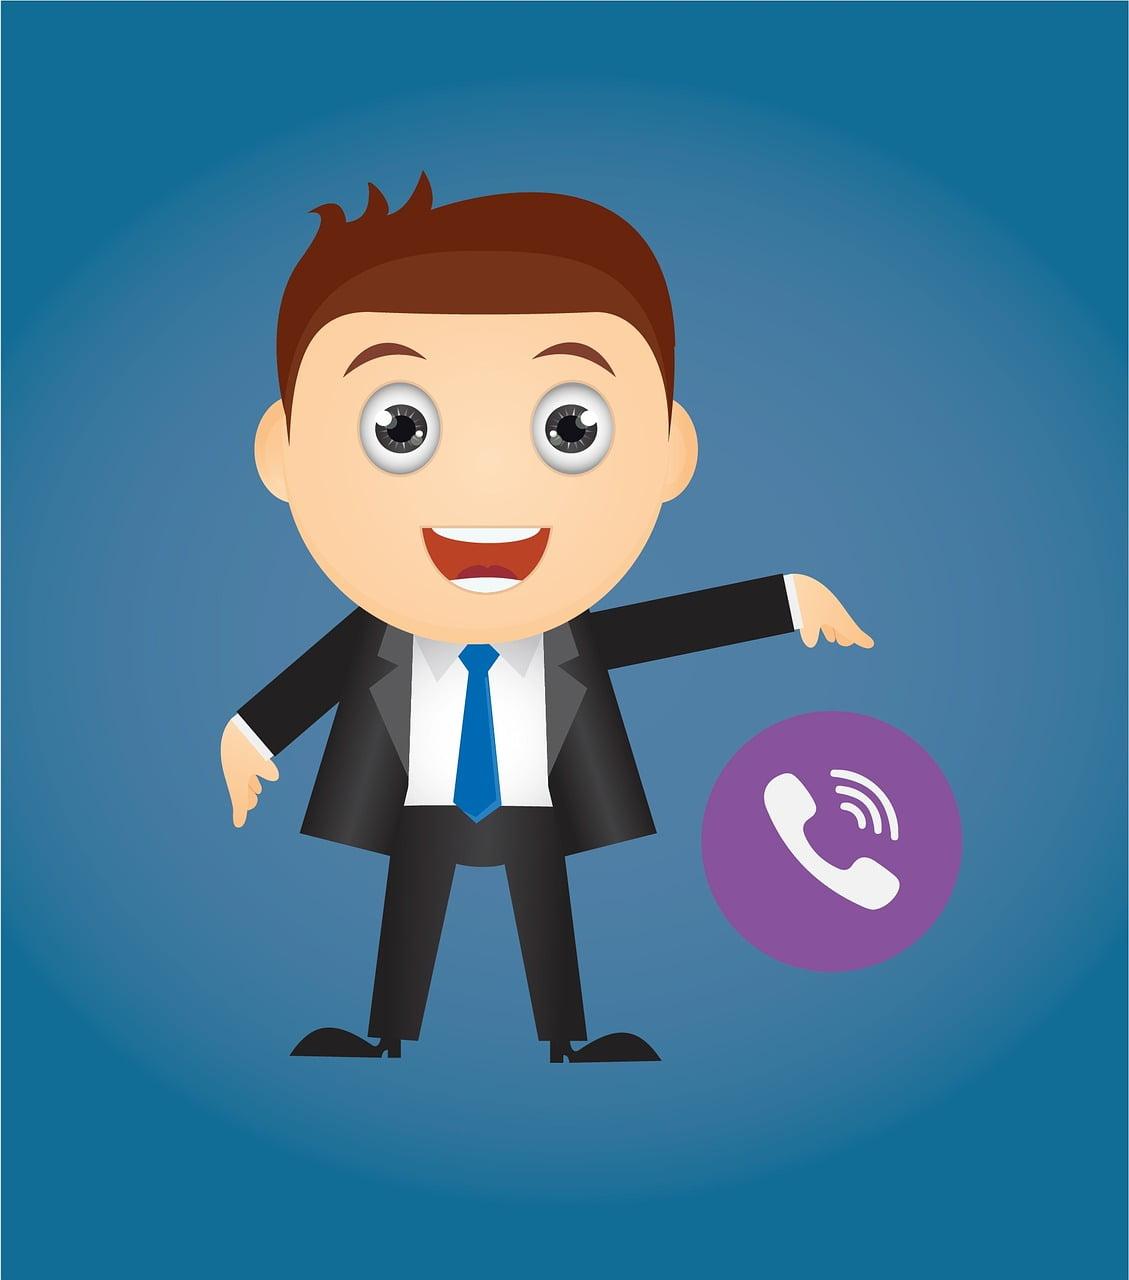 viber marketing strategies